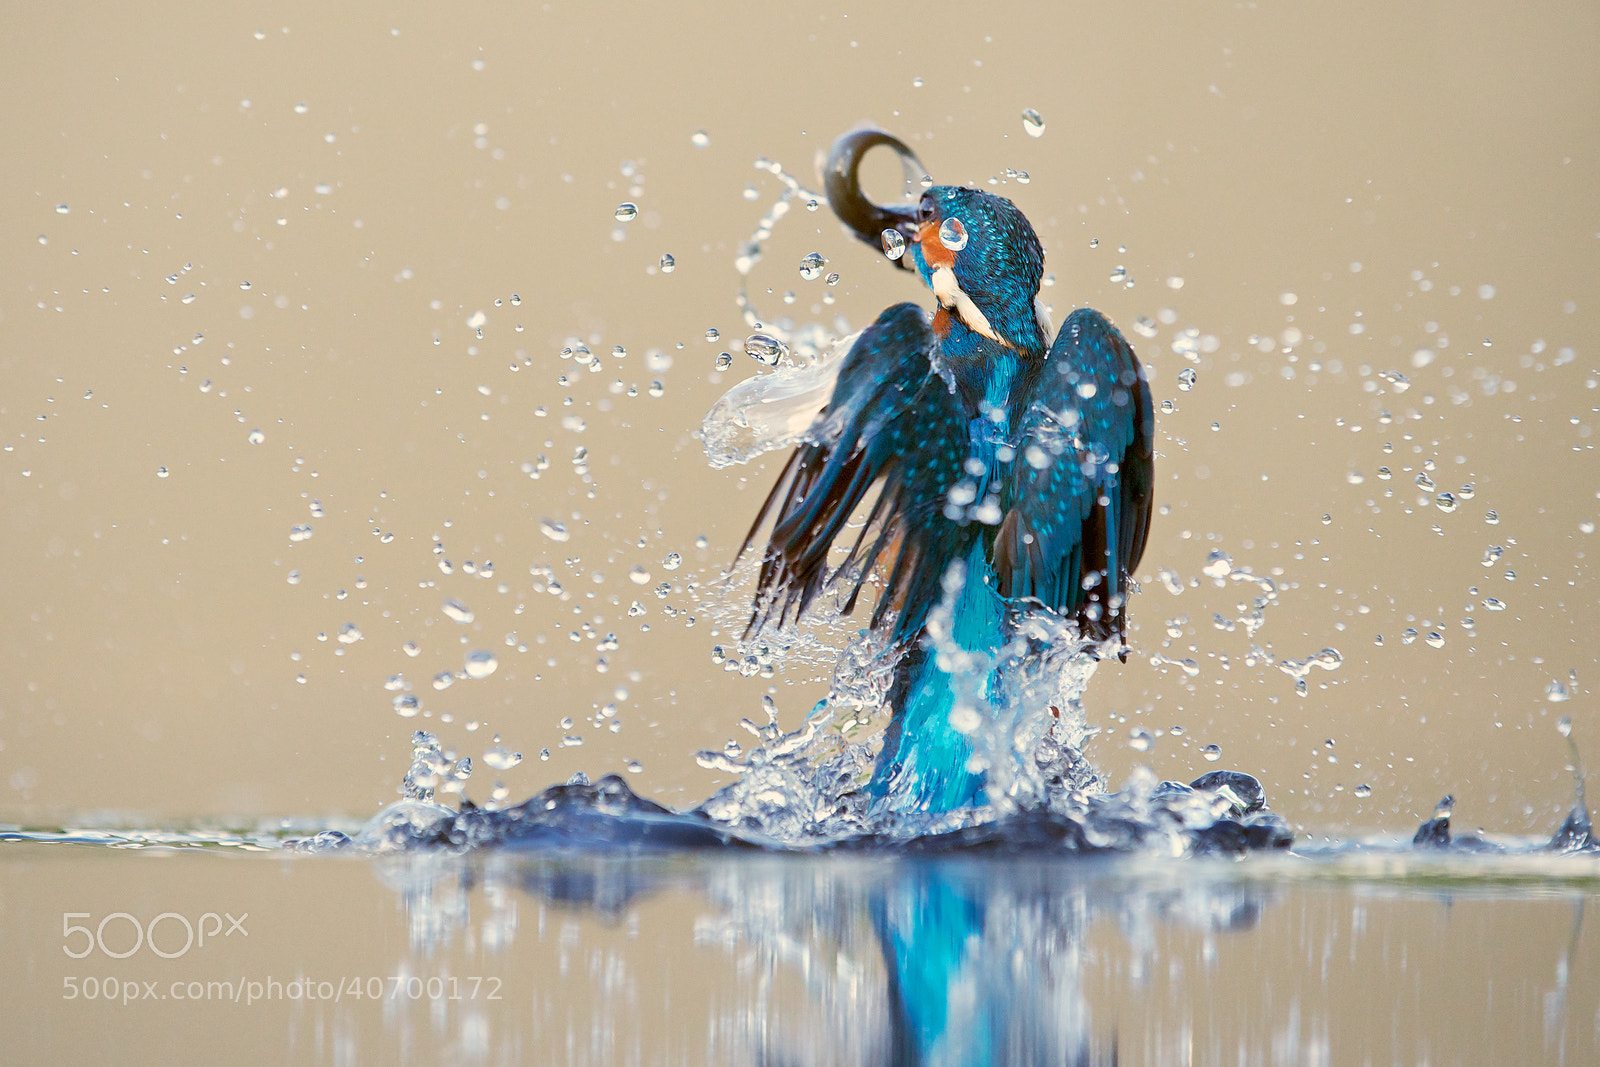 Photograph quick dip by Mark Bridger on 500px